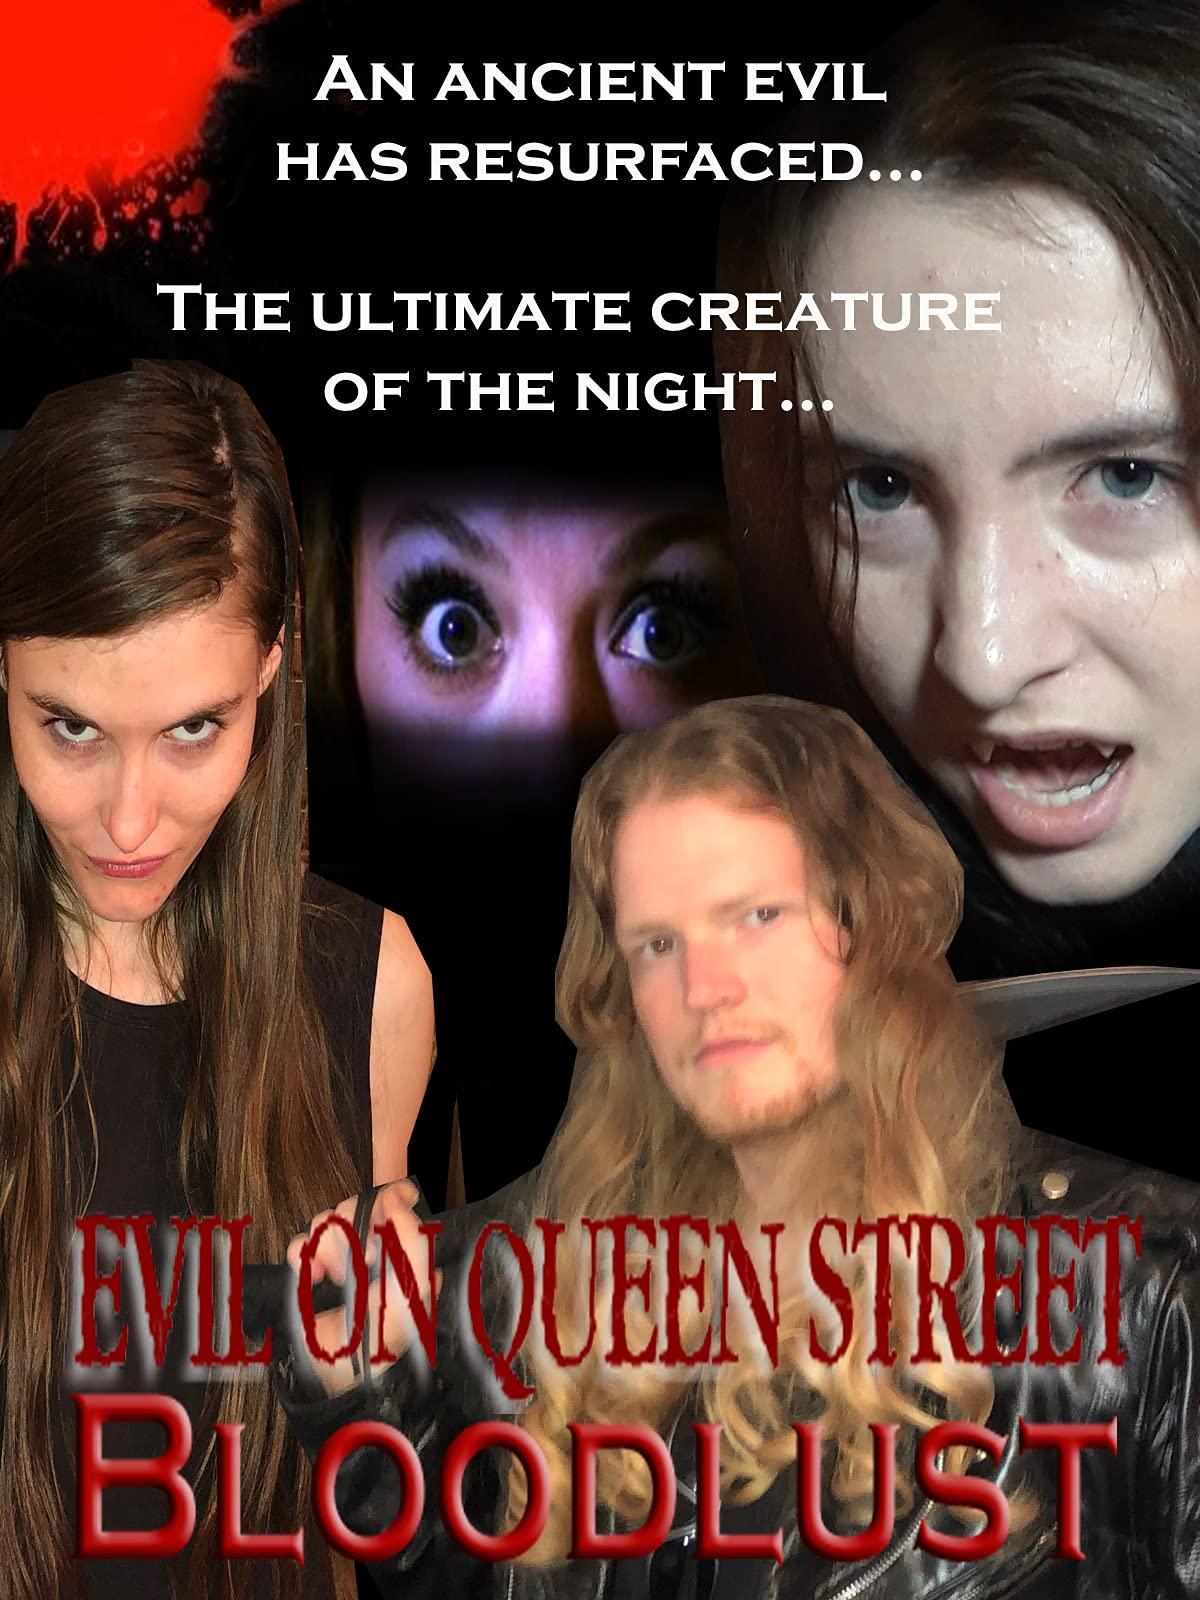 Evil On Queen Street: Bloodlust on Amazon Prime Video UK